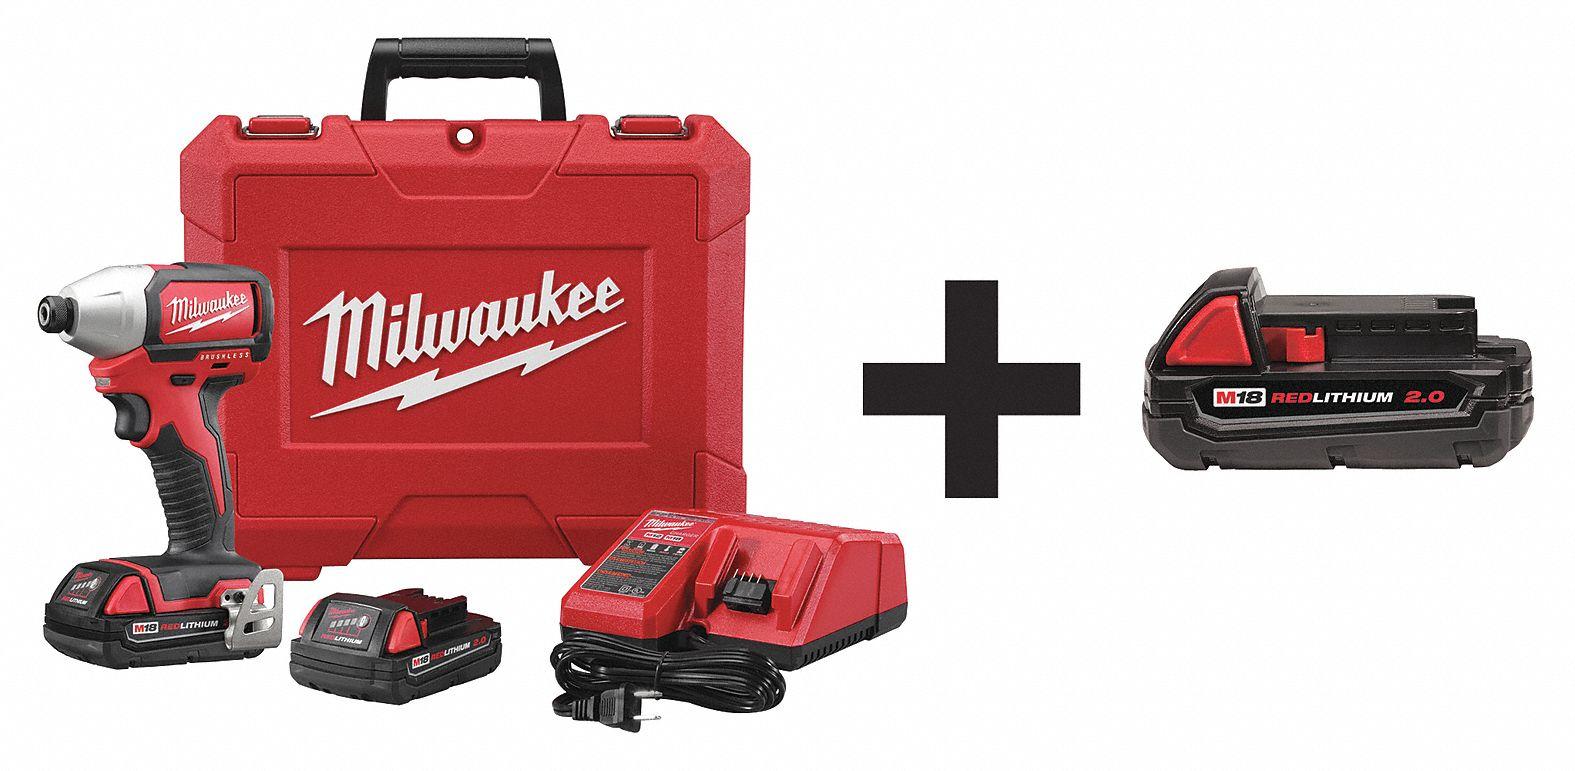 Milwaukee Cordless Impact Driver Kit 18 0v 1 Tool 7dy12